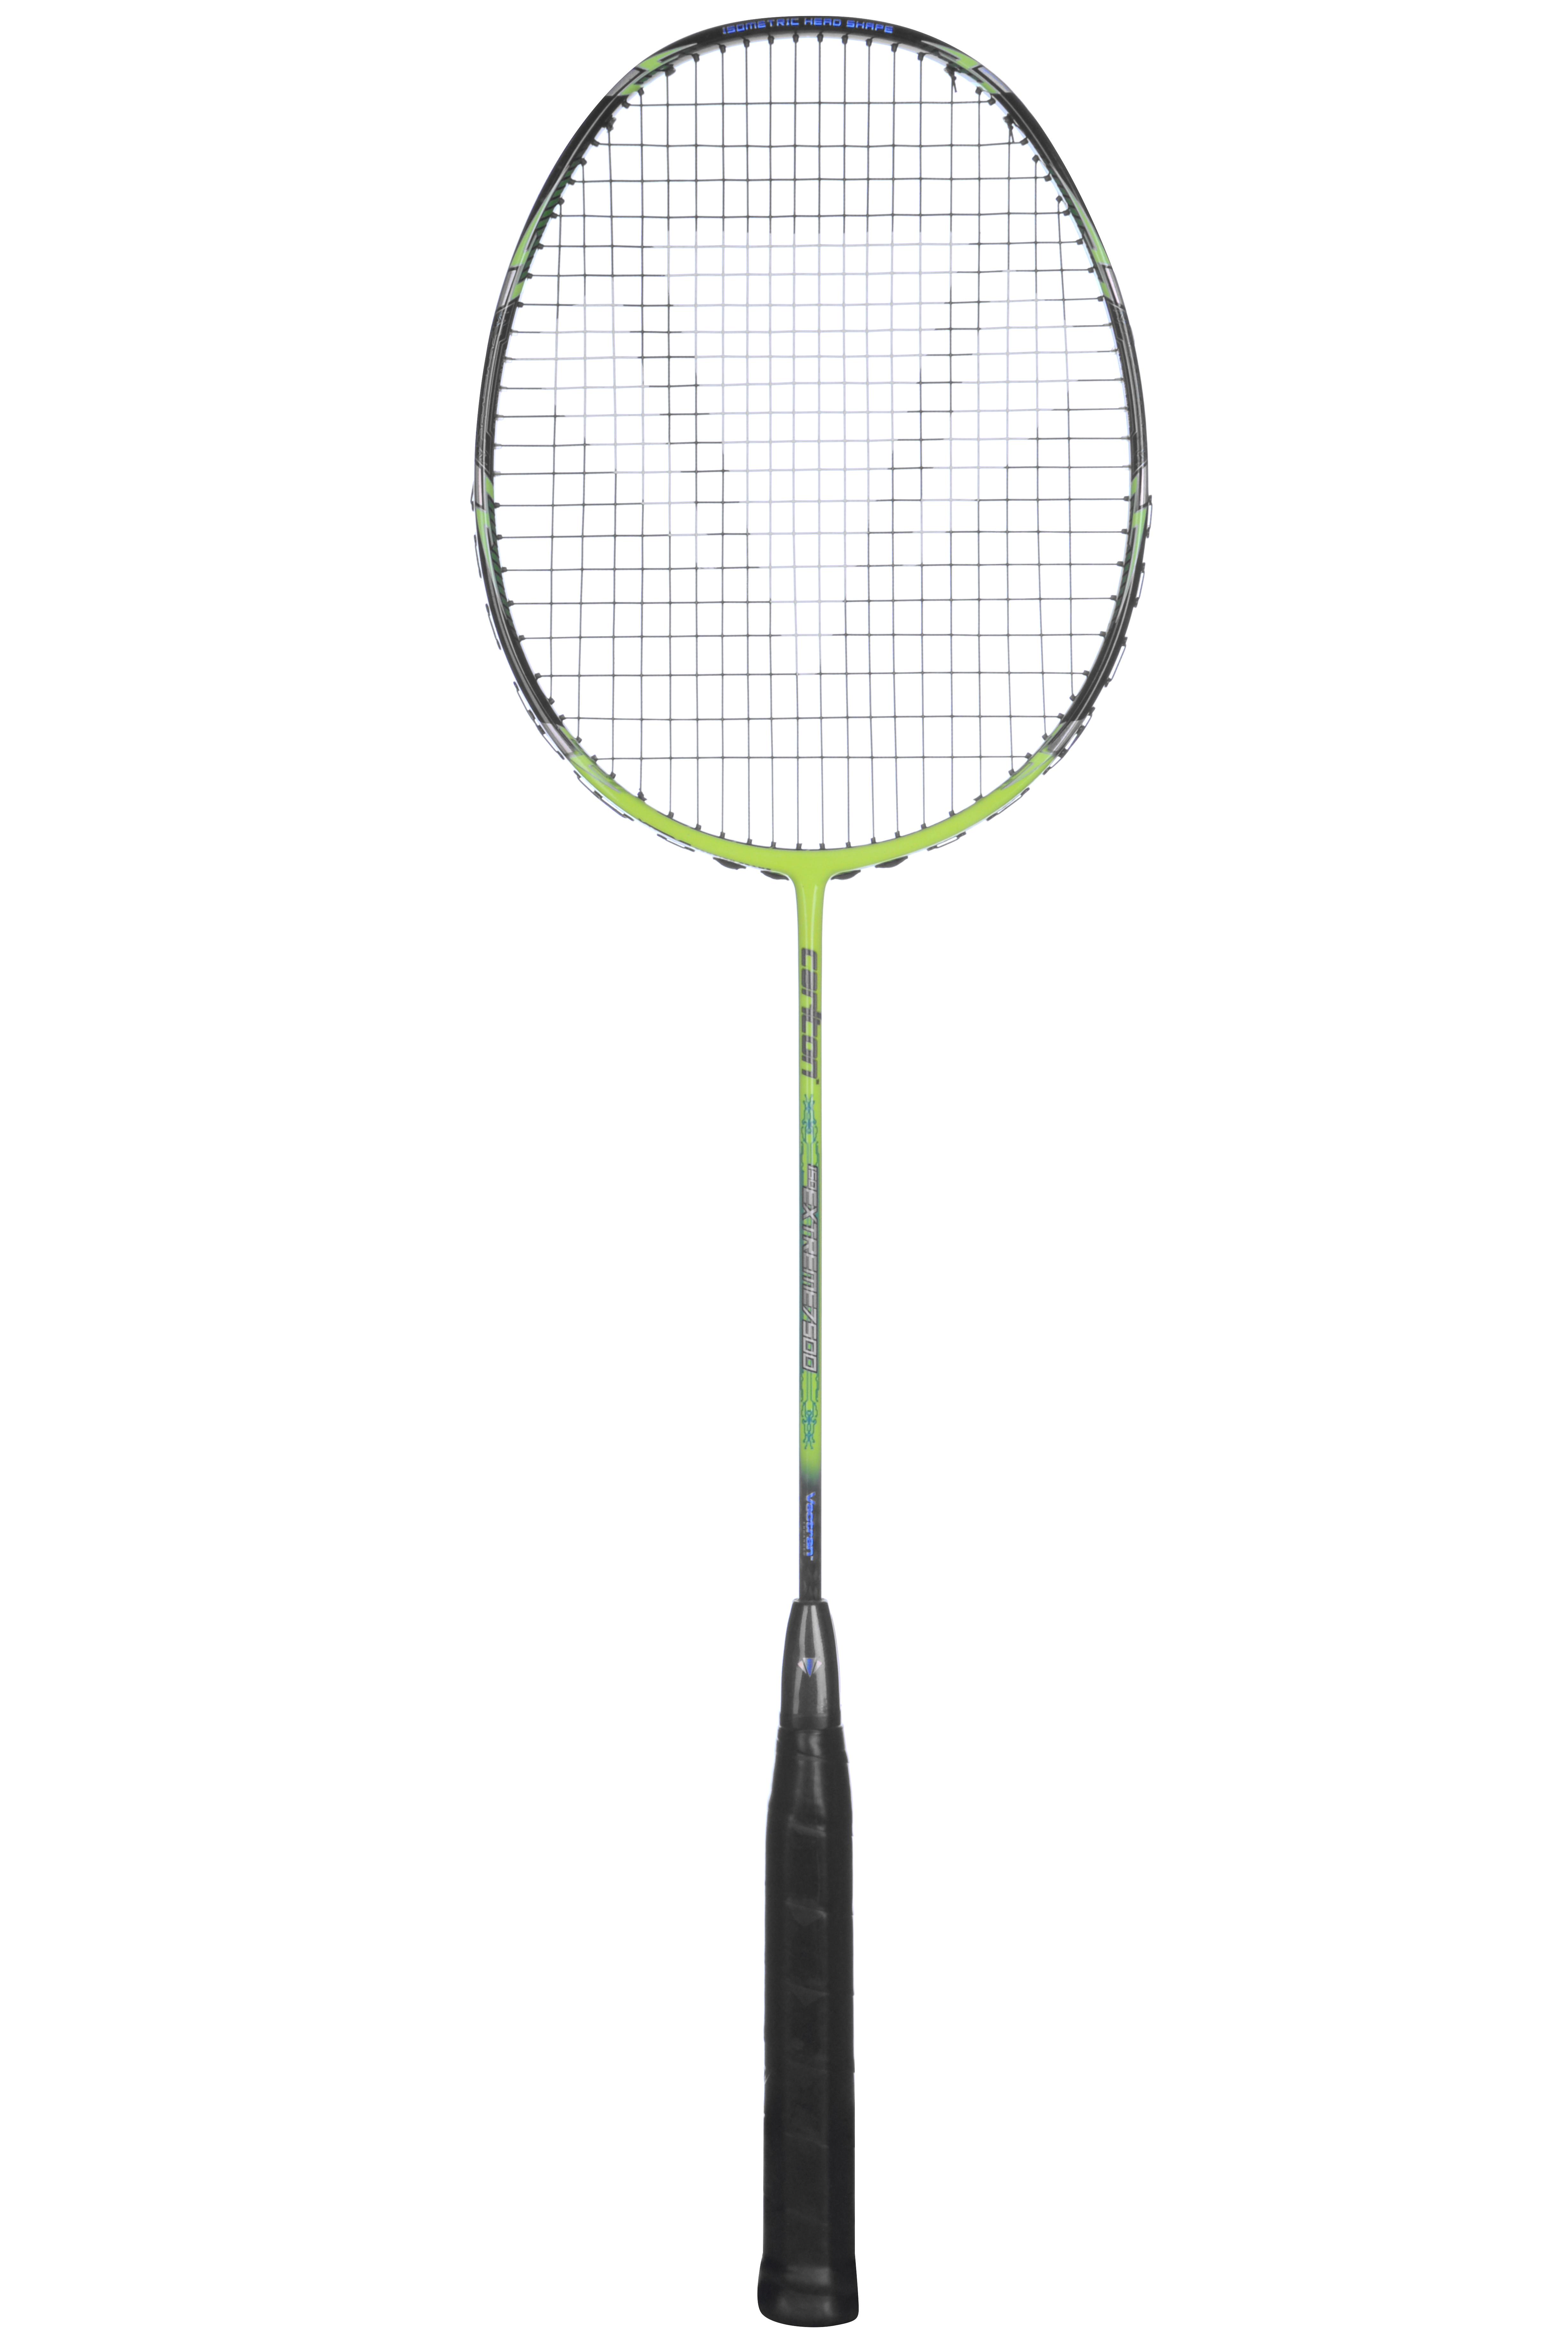 Image of   Carlton ISO -Extreme 7500 Badminton ketcher - Gul / Sort